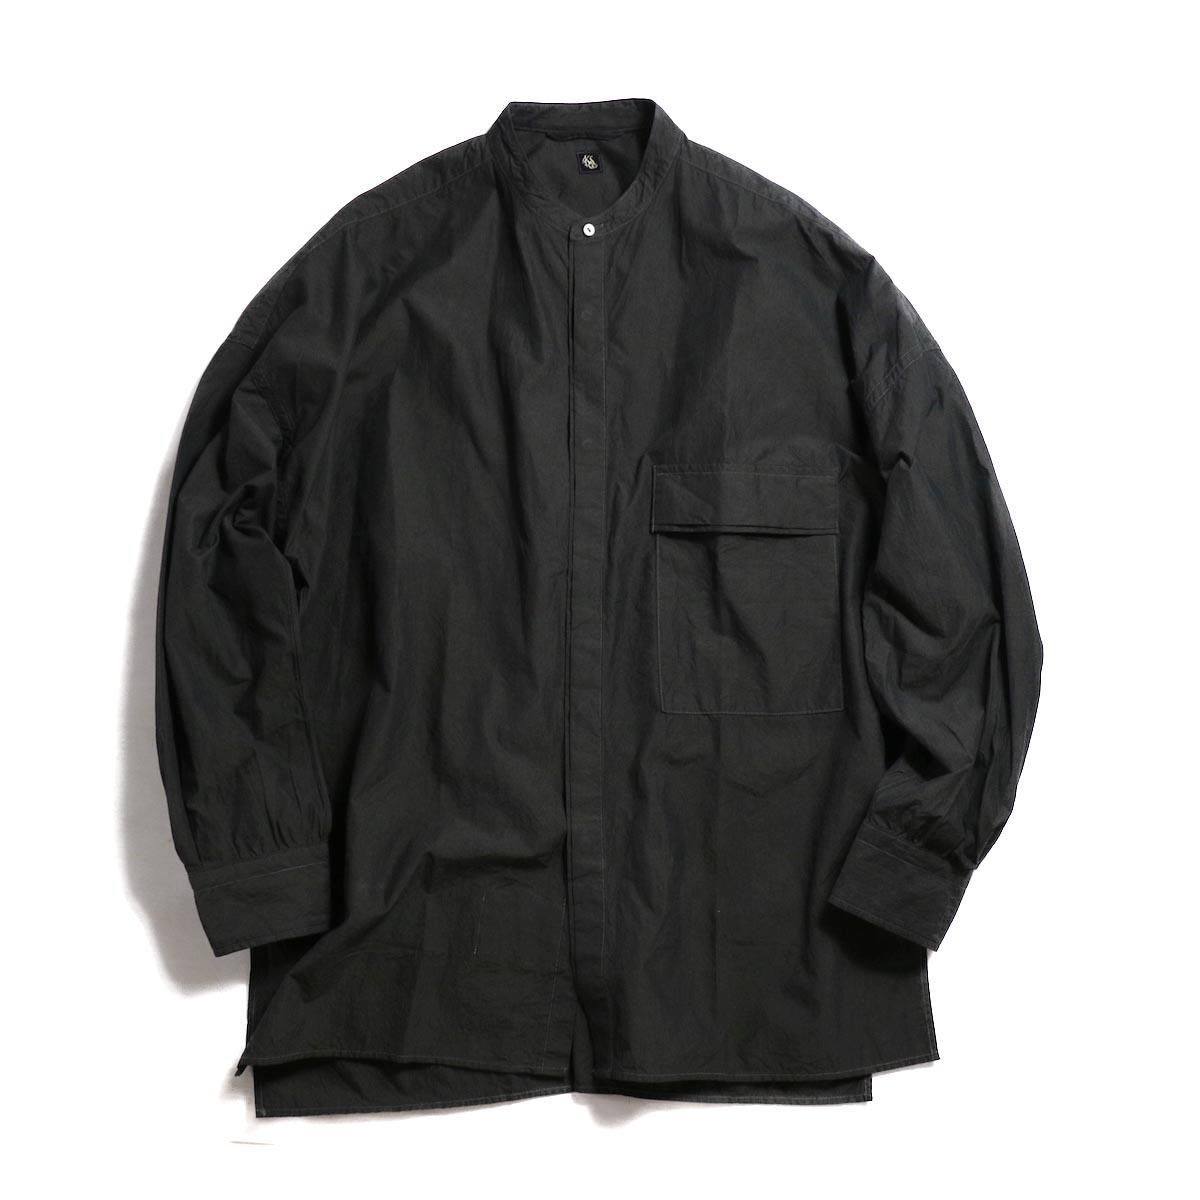 Kaptain Sunshine / Fly Front Band Collar Shirt -Charcoal Gray